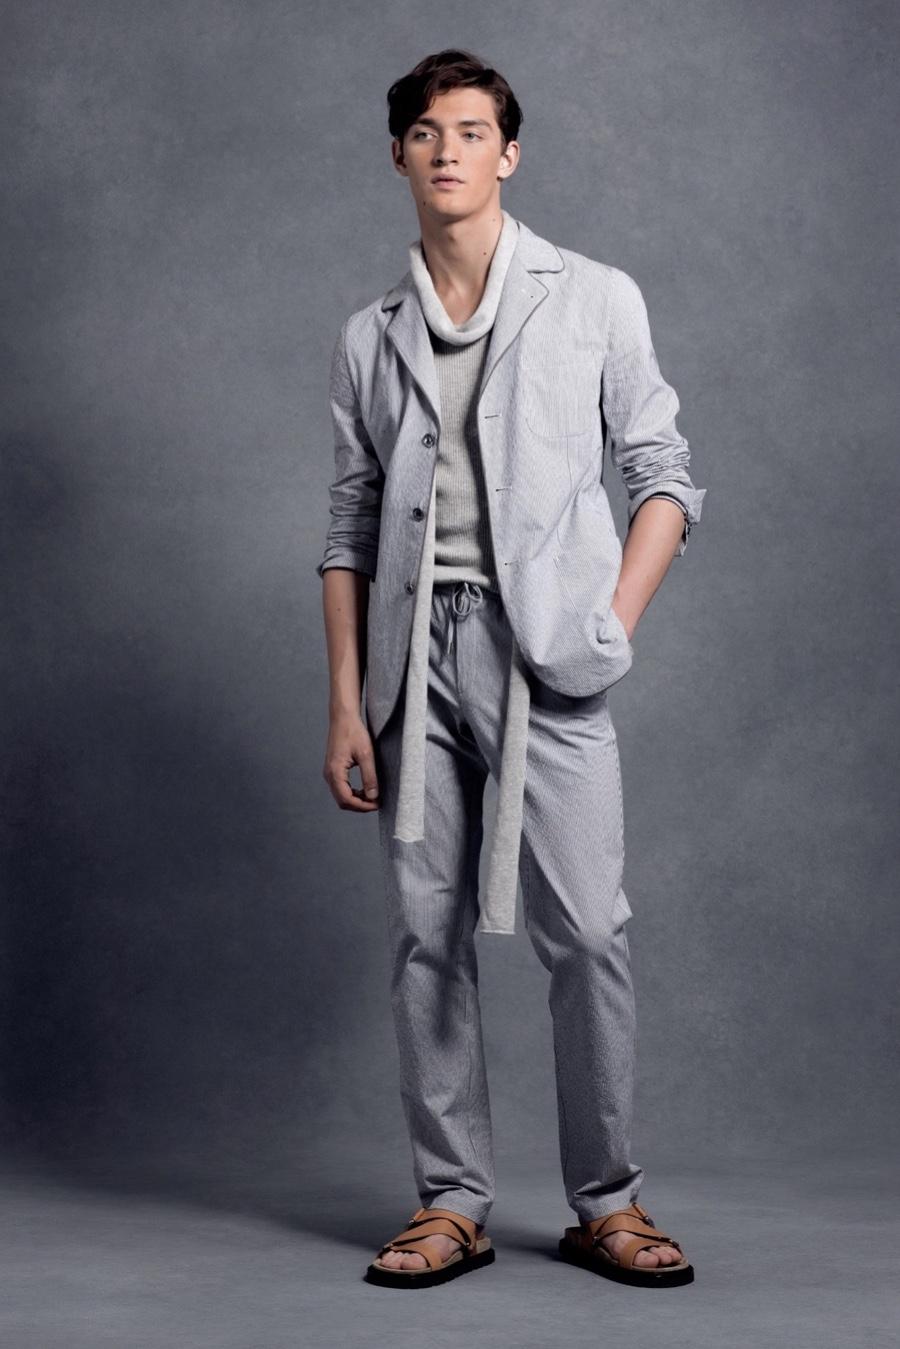 eidem_Michael Kors Spring/Summer 2016 Collection | New York Fashion Week: Men | The Fashionisto